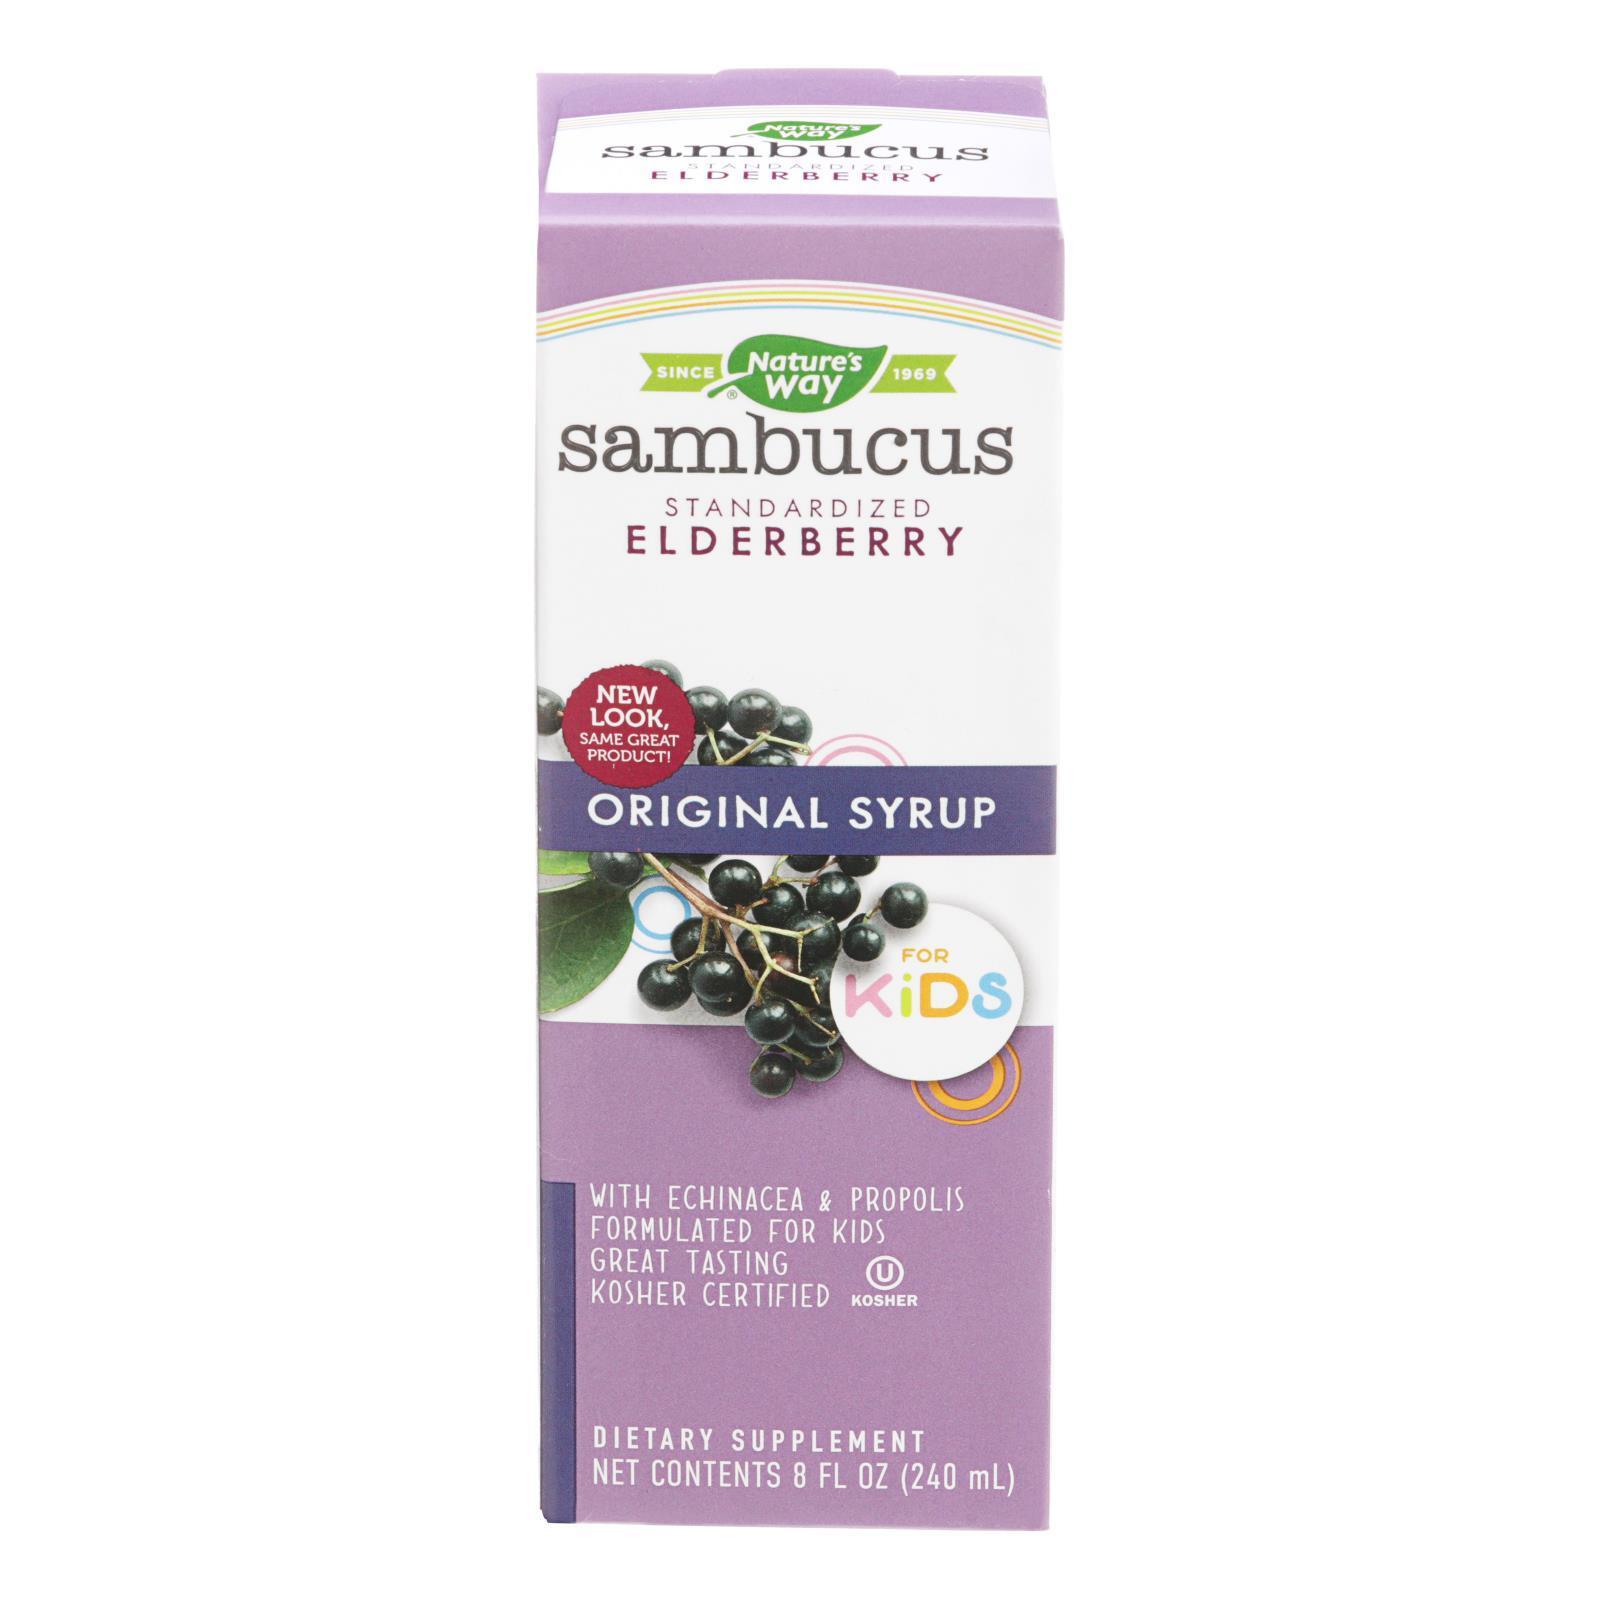 Nature's Way Original Sambucus for Kids - Standardized Elderberry - 8 fl oz